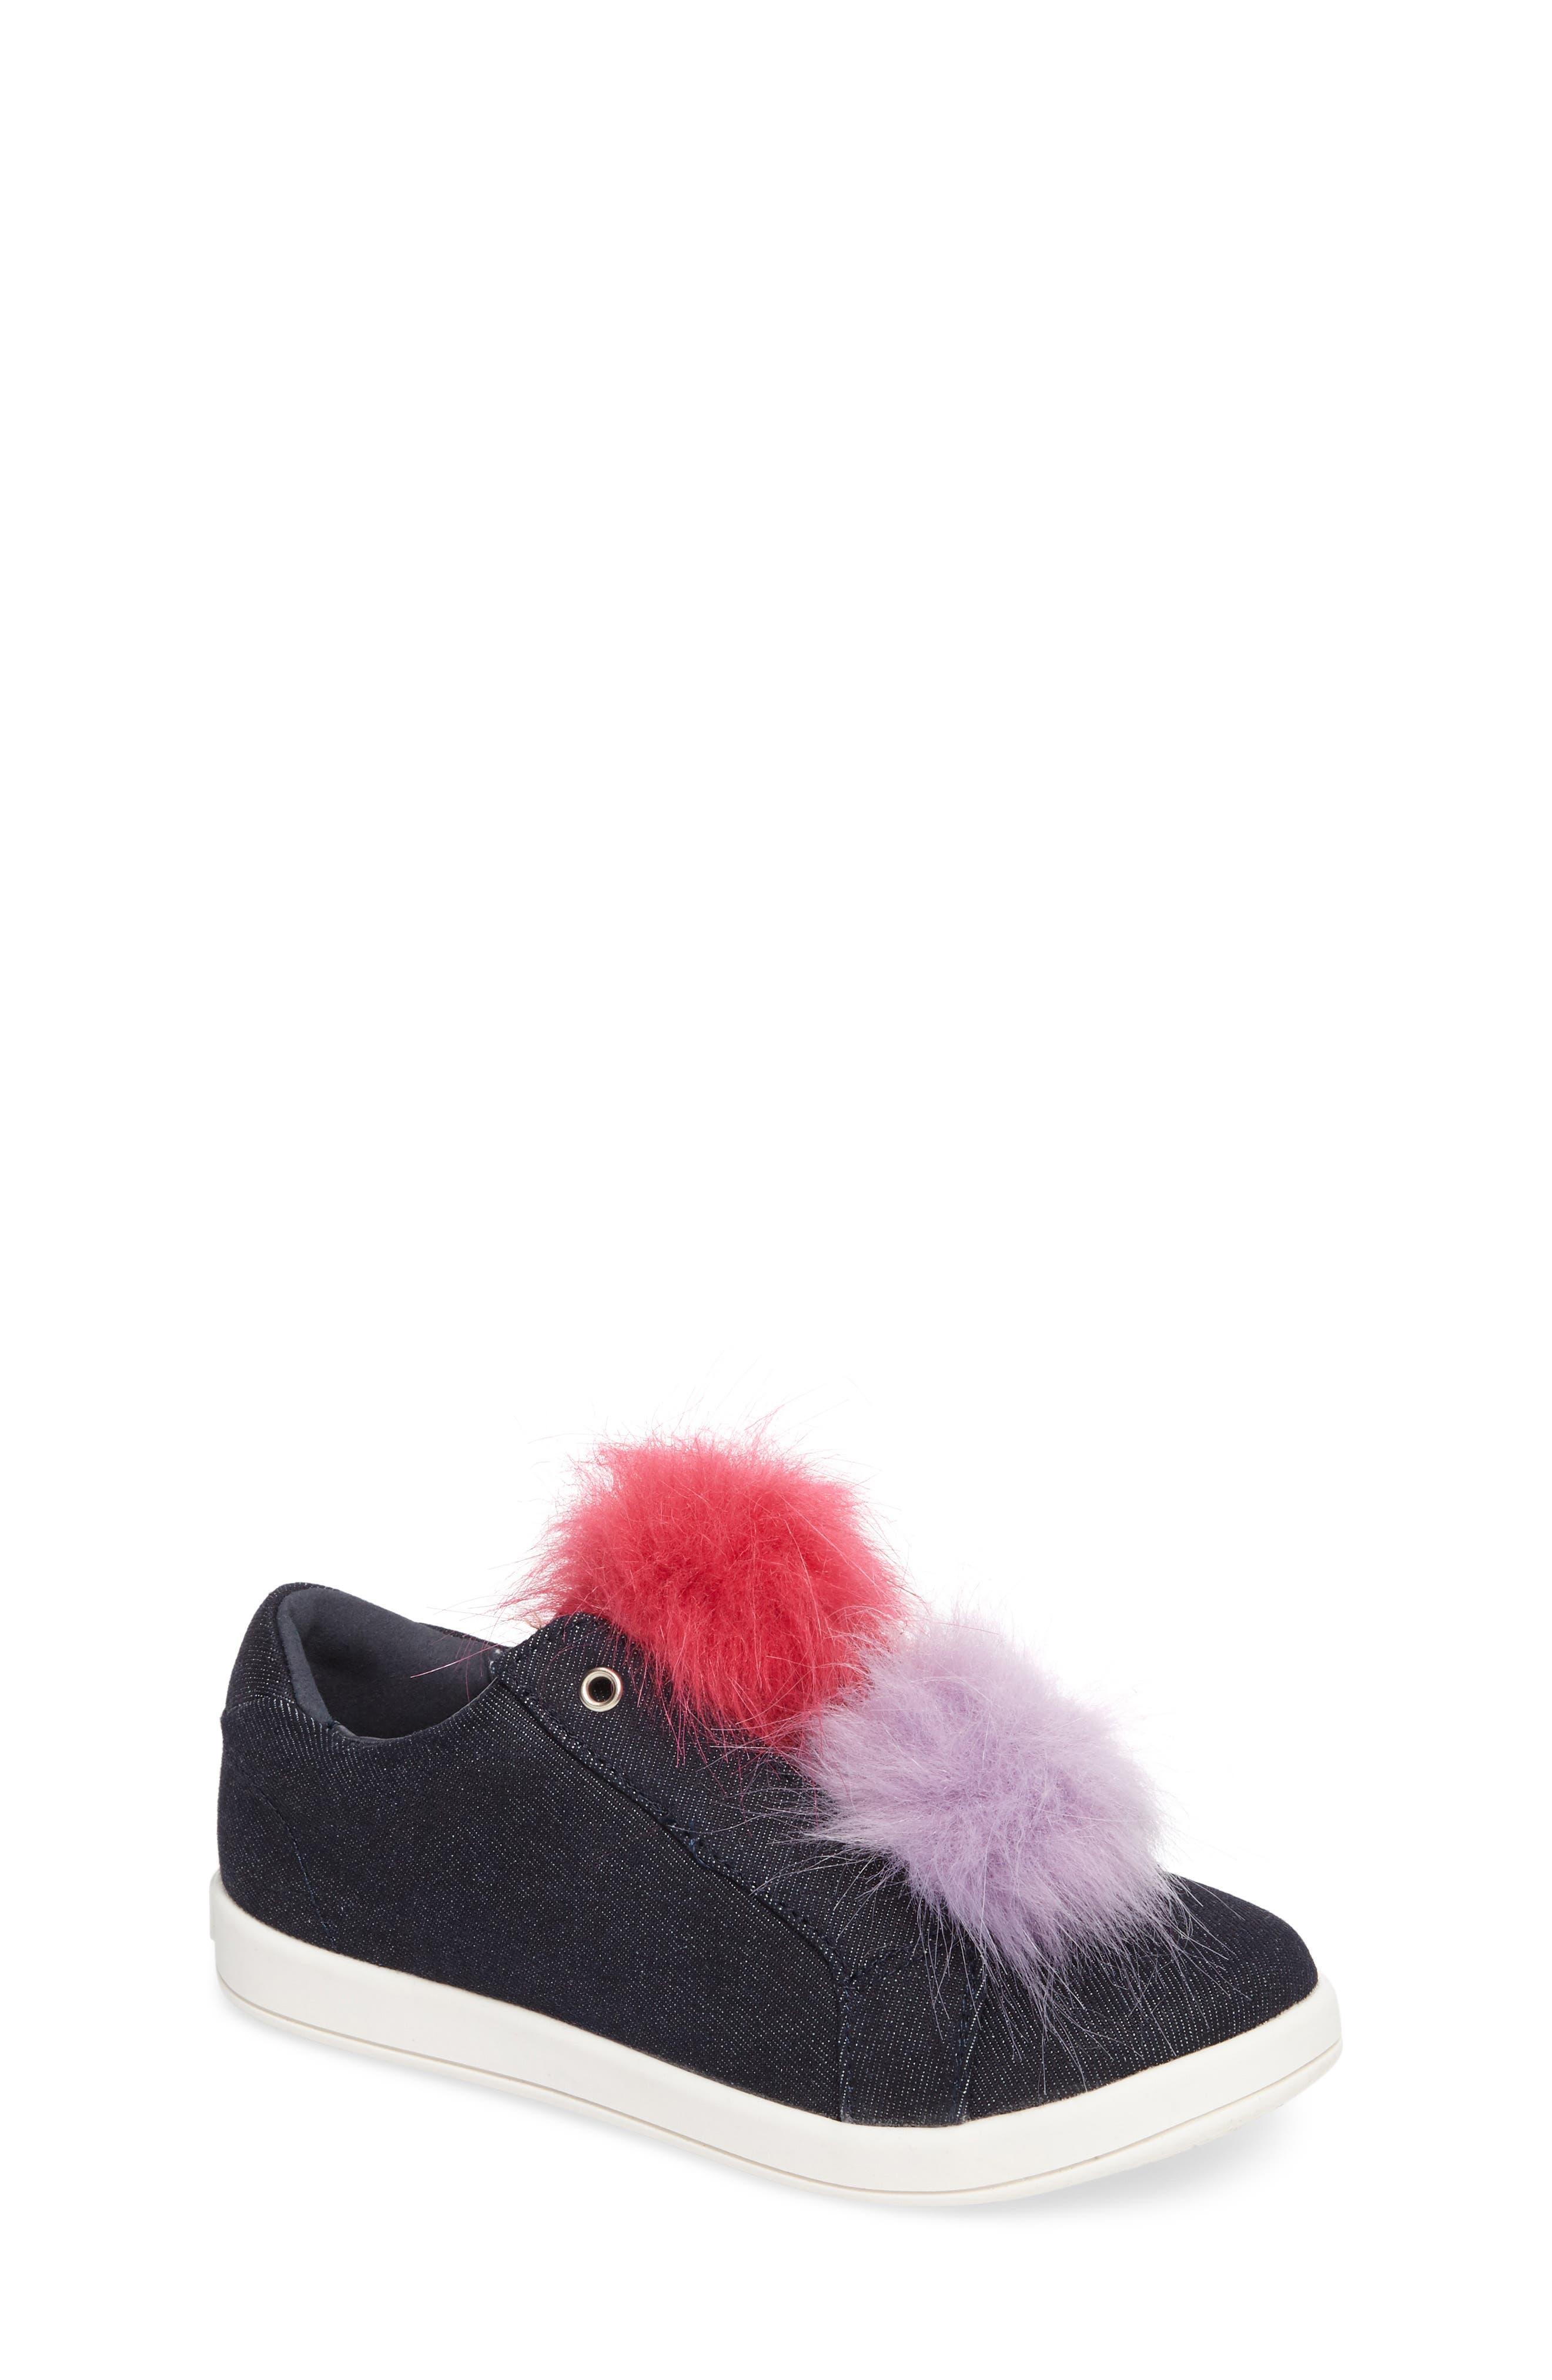 Cynthia Leya Faux Fur Pompom Slip-On Sneaker,                             Main thumbnail 1, color,                             Denim